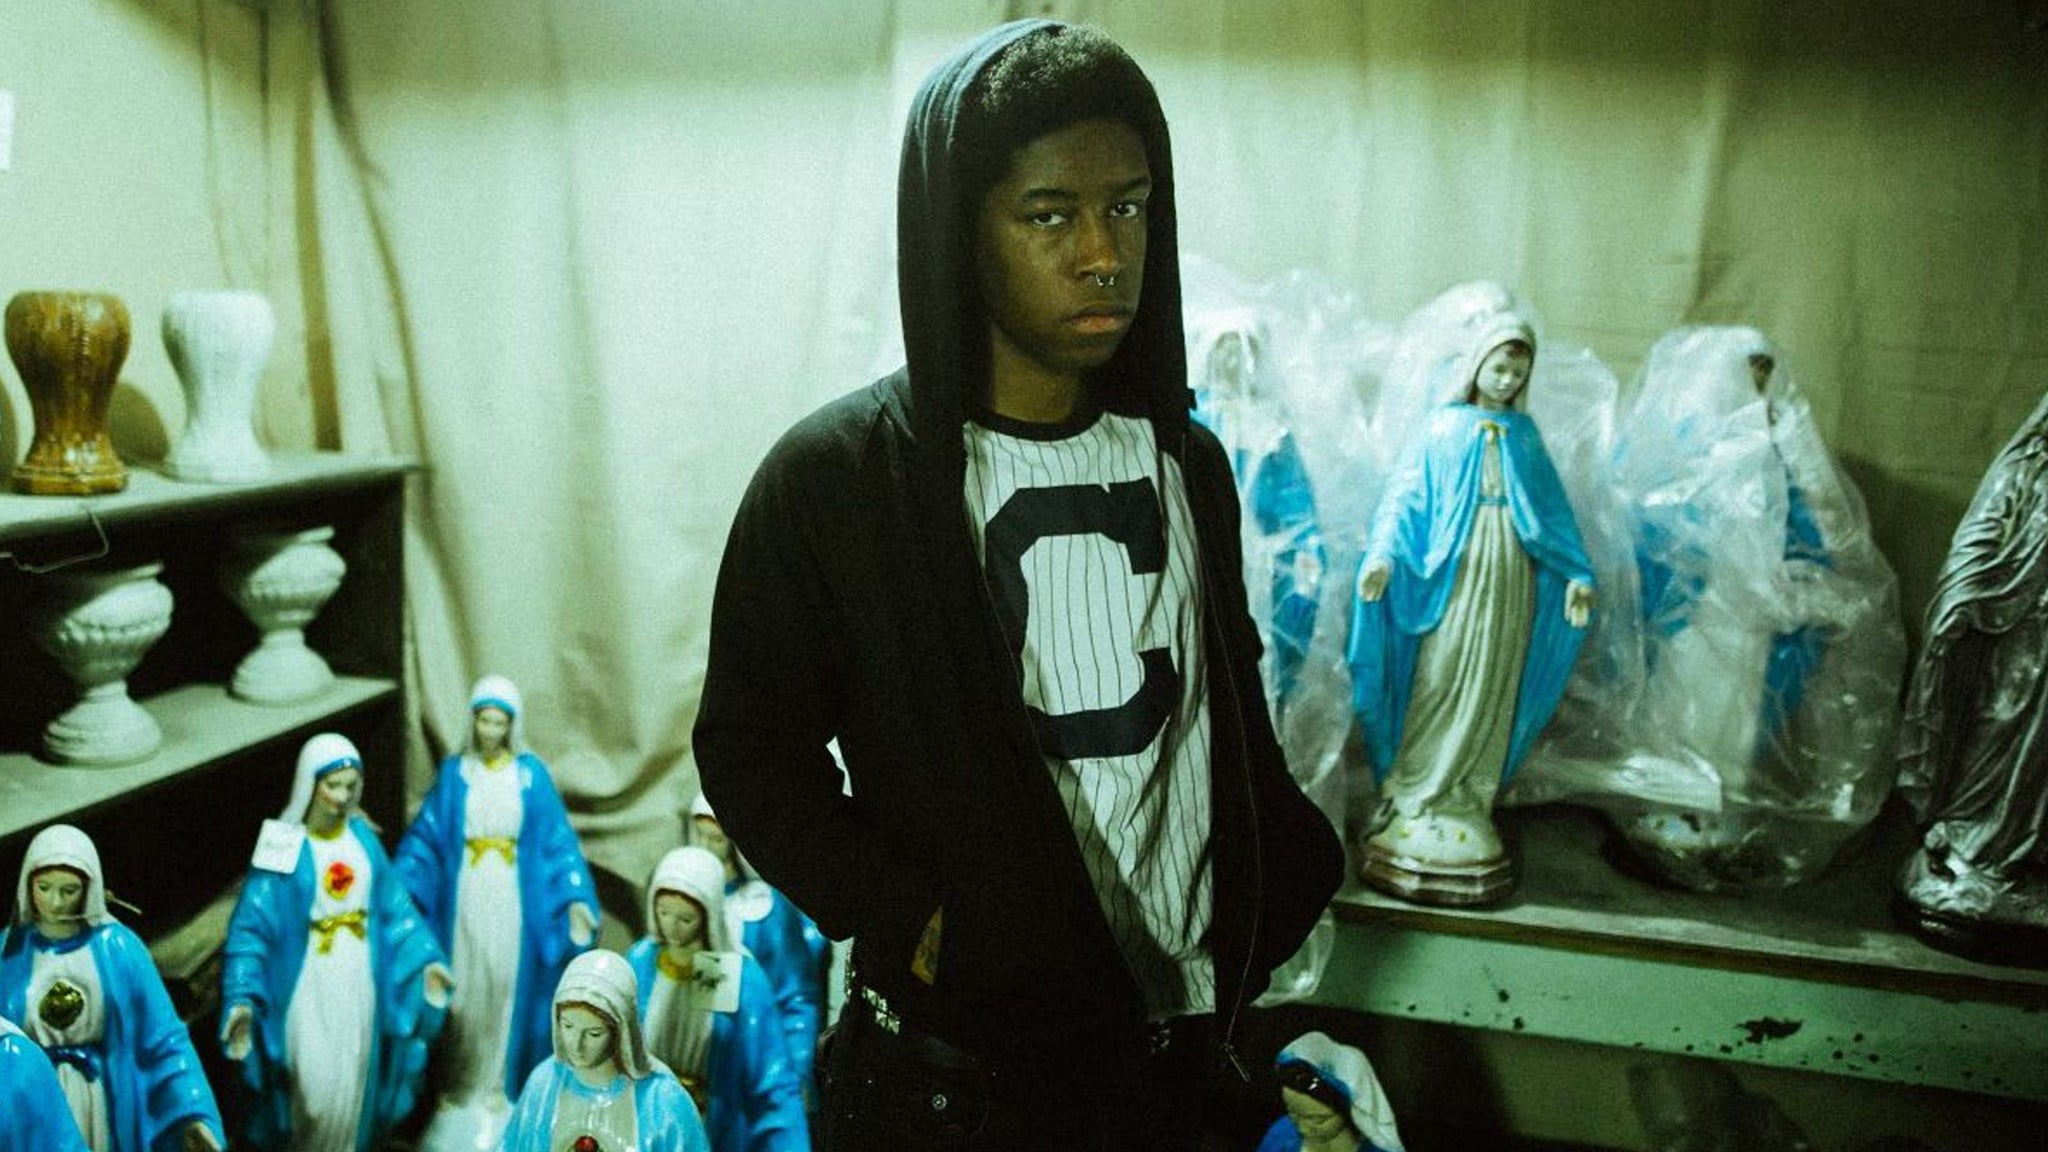 Shaky Knees Presents: KennyHoopla at The Masquerade - Hell